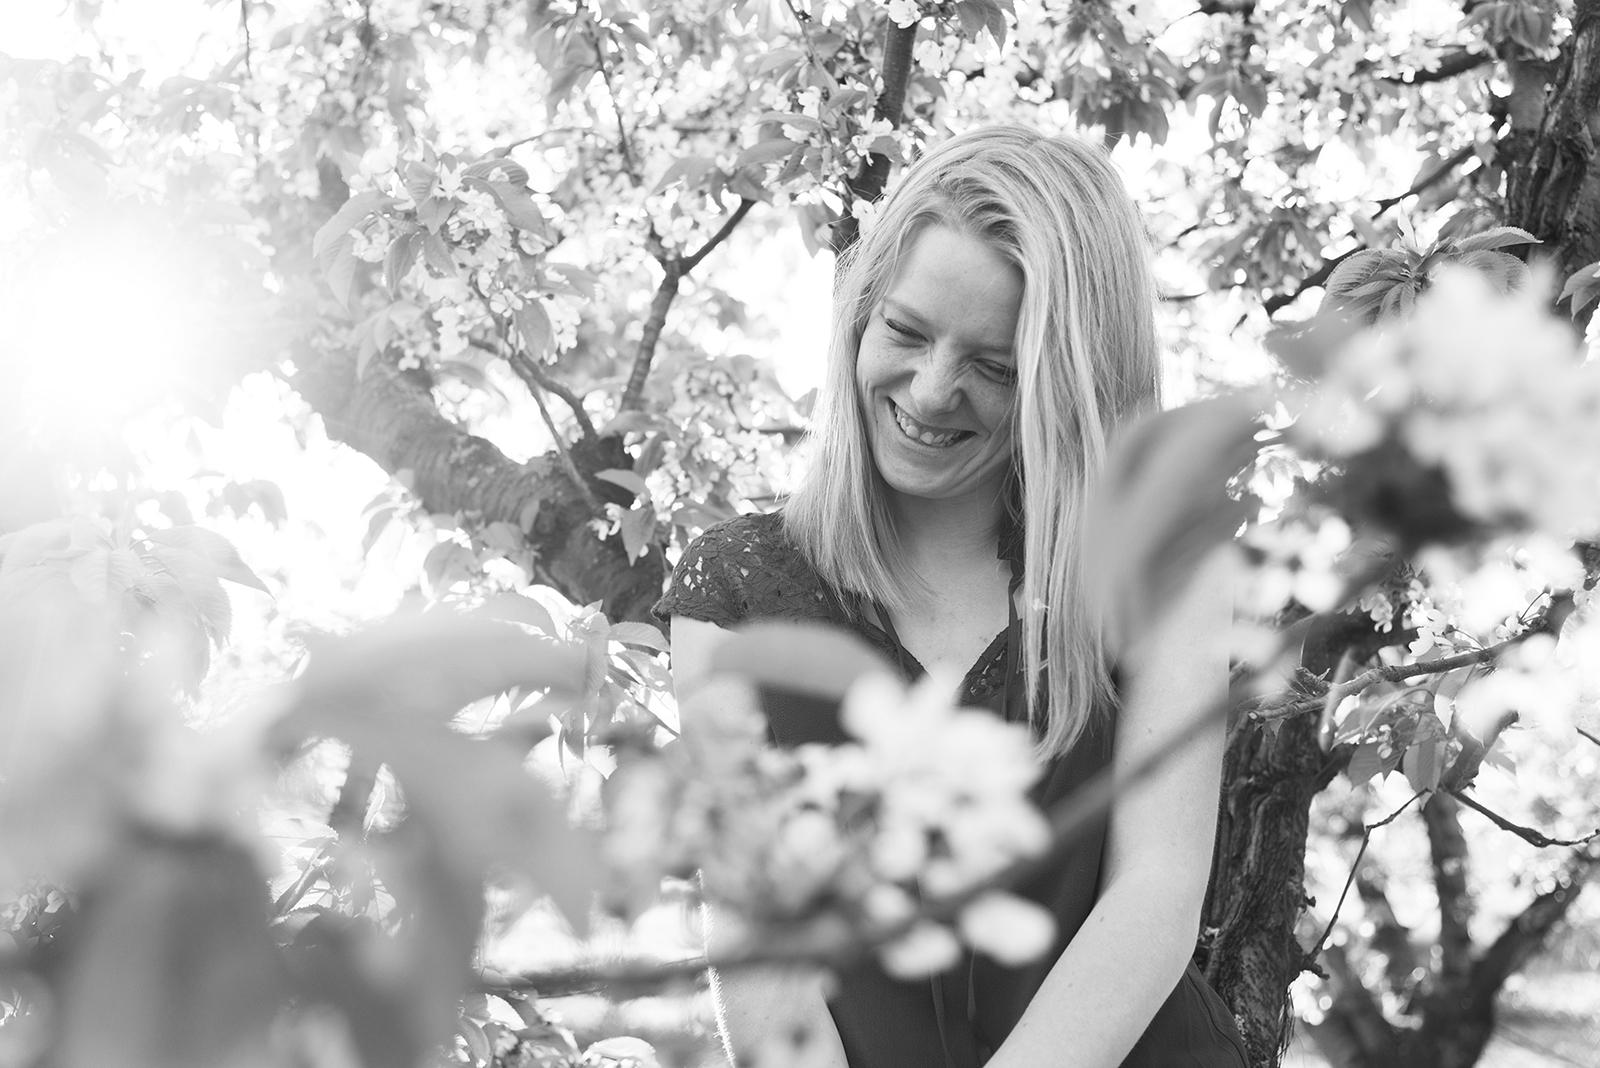 jeune fille dans un cerisier